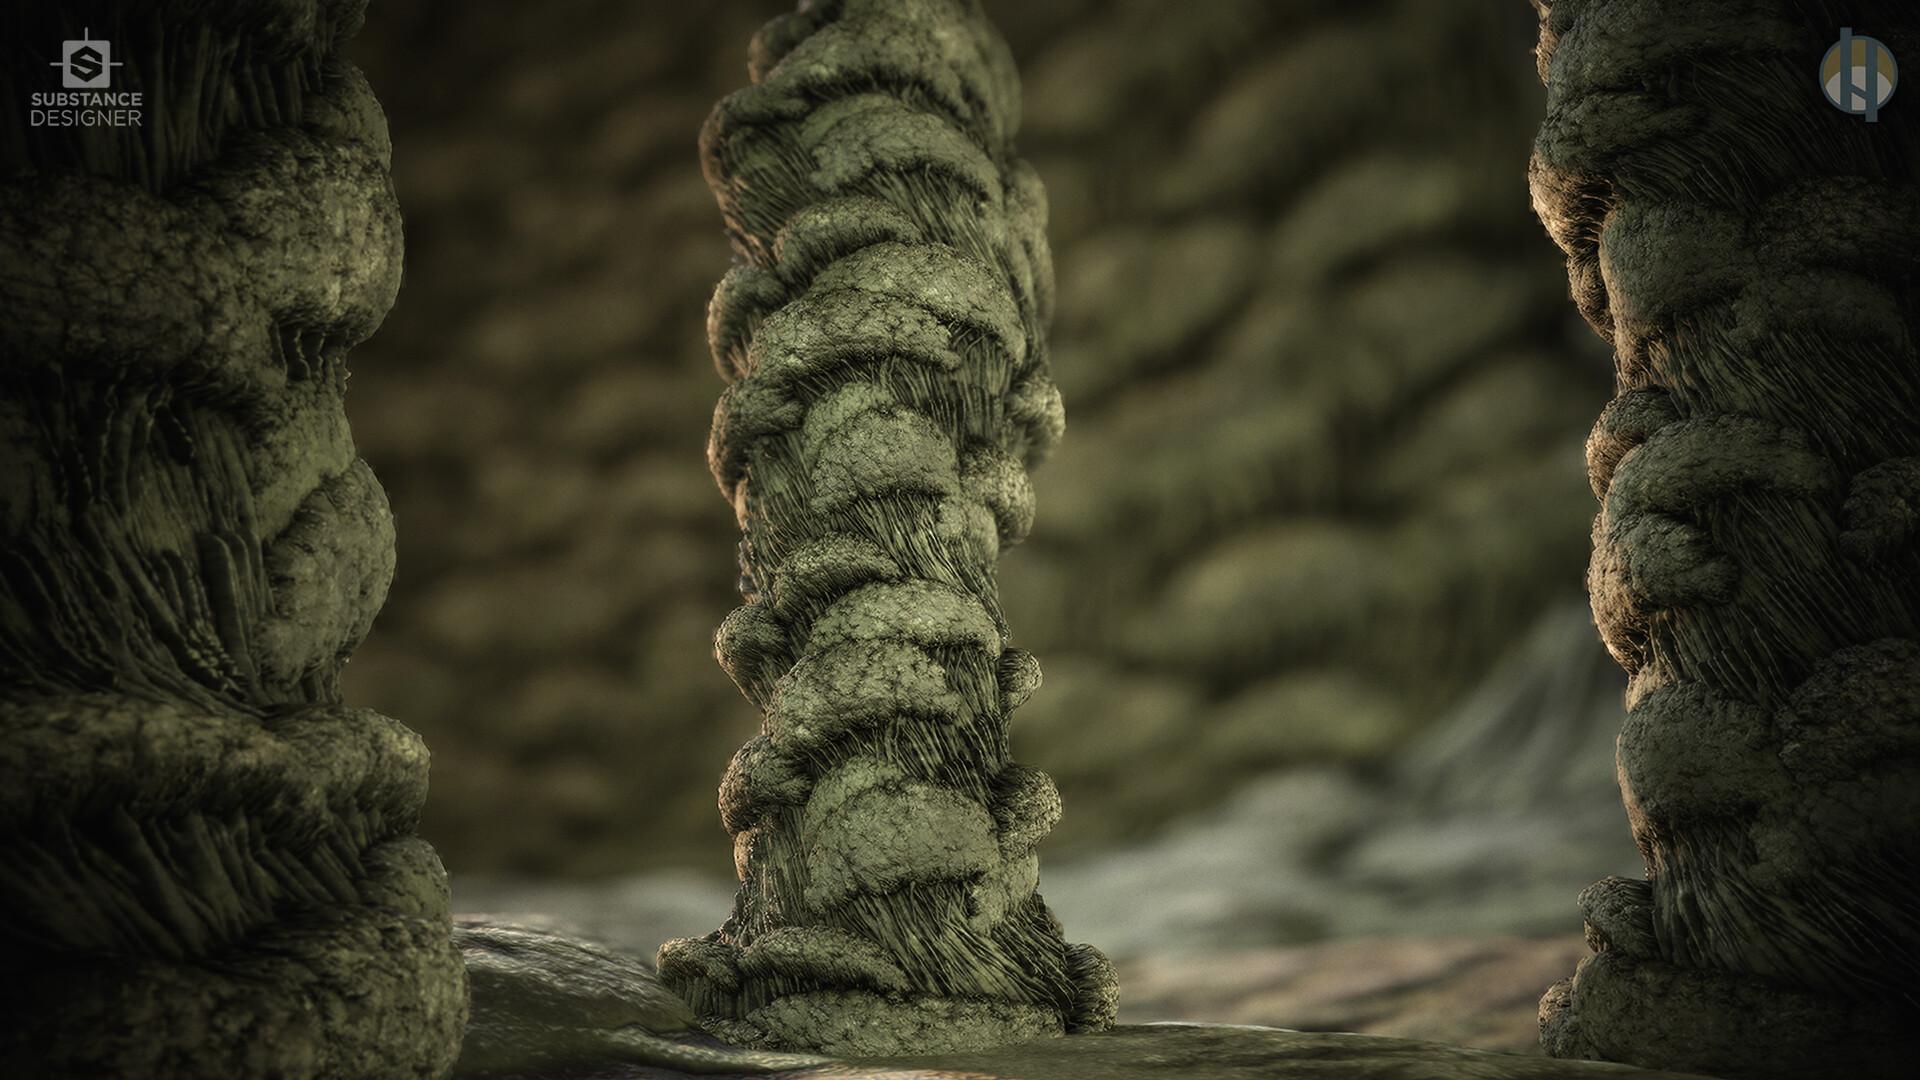 Justin hrala cave stalactite wall column